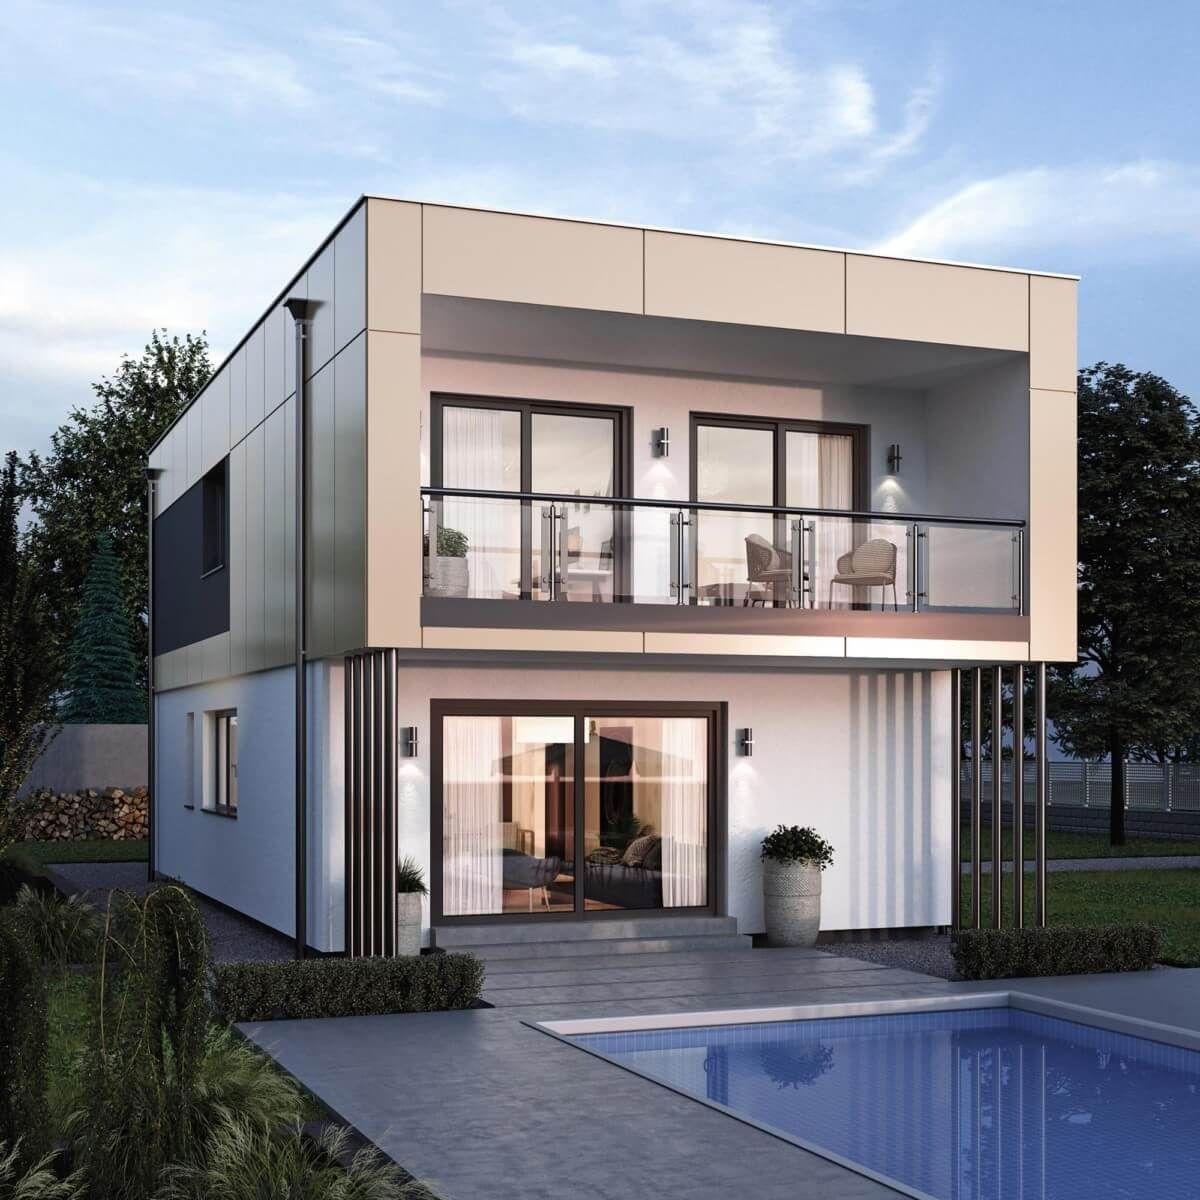 preise fertighaus trendy tolle schne dekoration. Black Bedroom Furniture Sets. Home Design Ideas